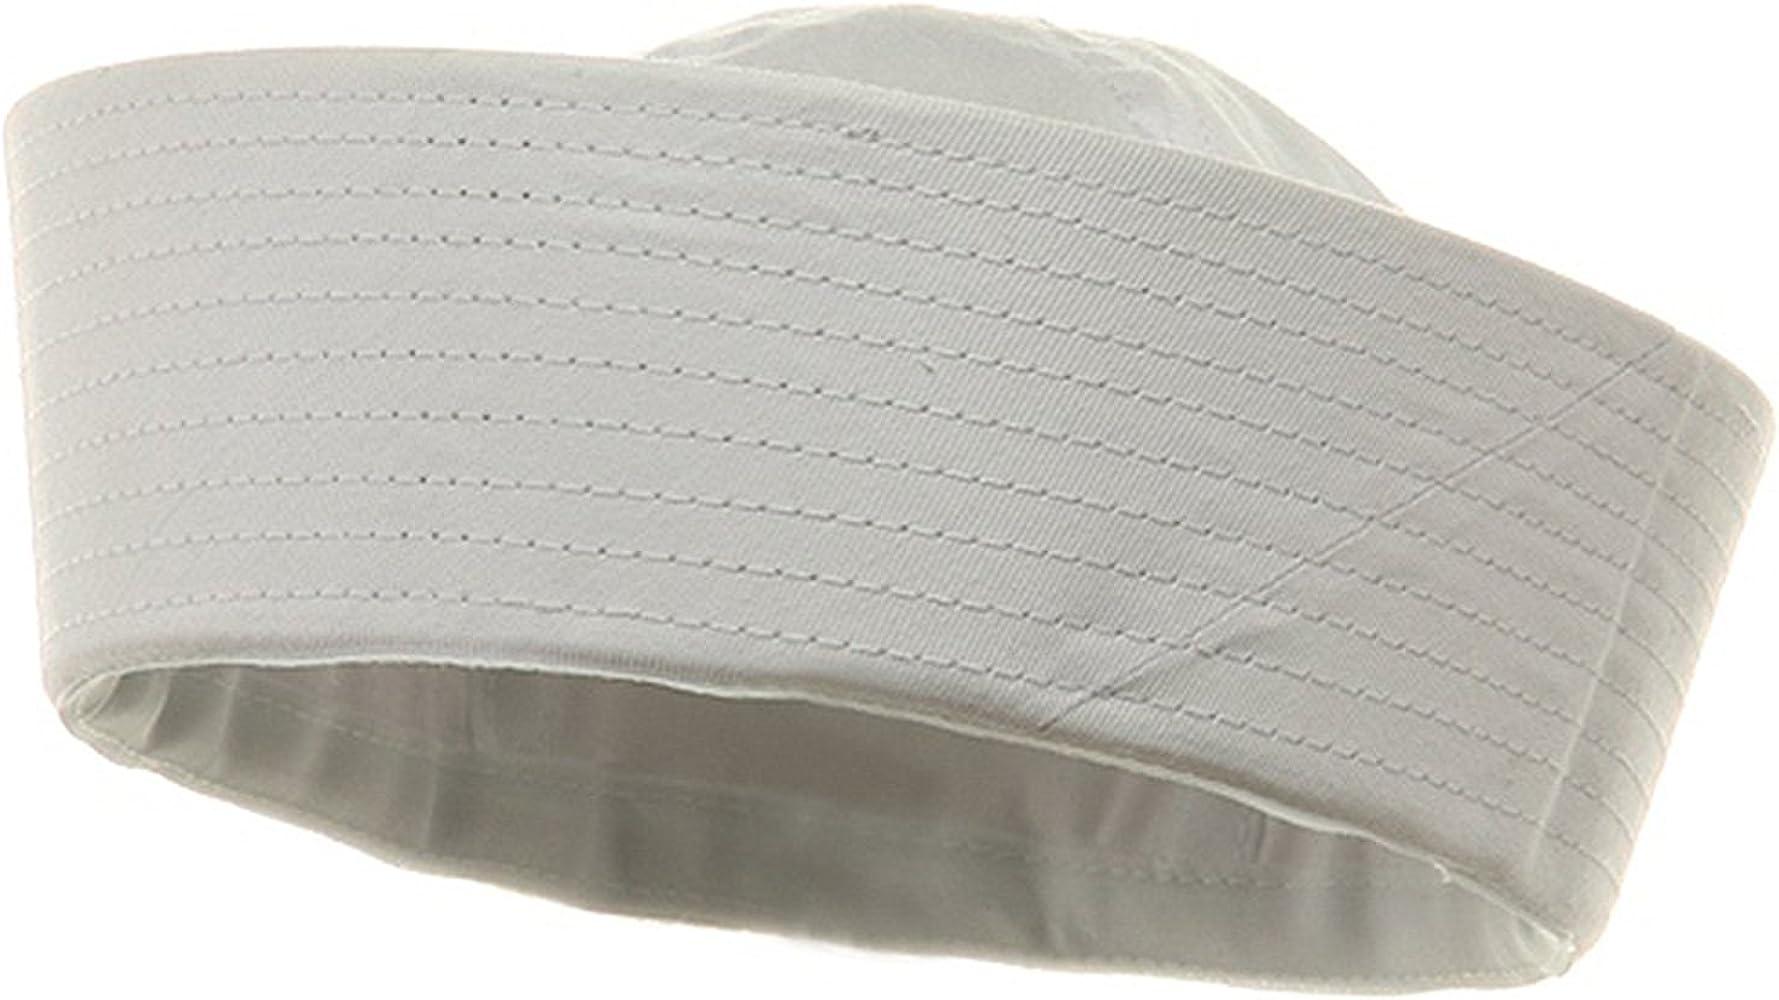 Genuine Issue GI White Military US Navy Cotton GOB Sailor Hat